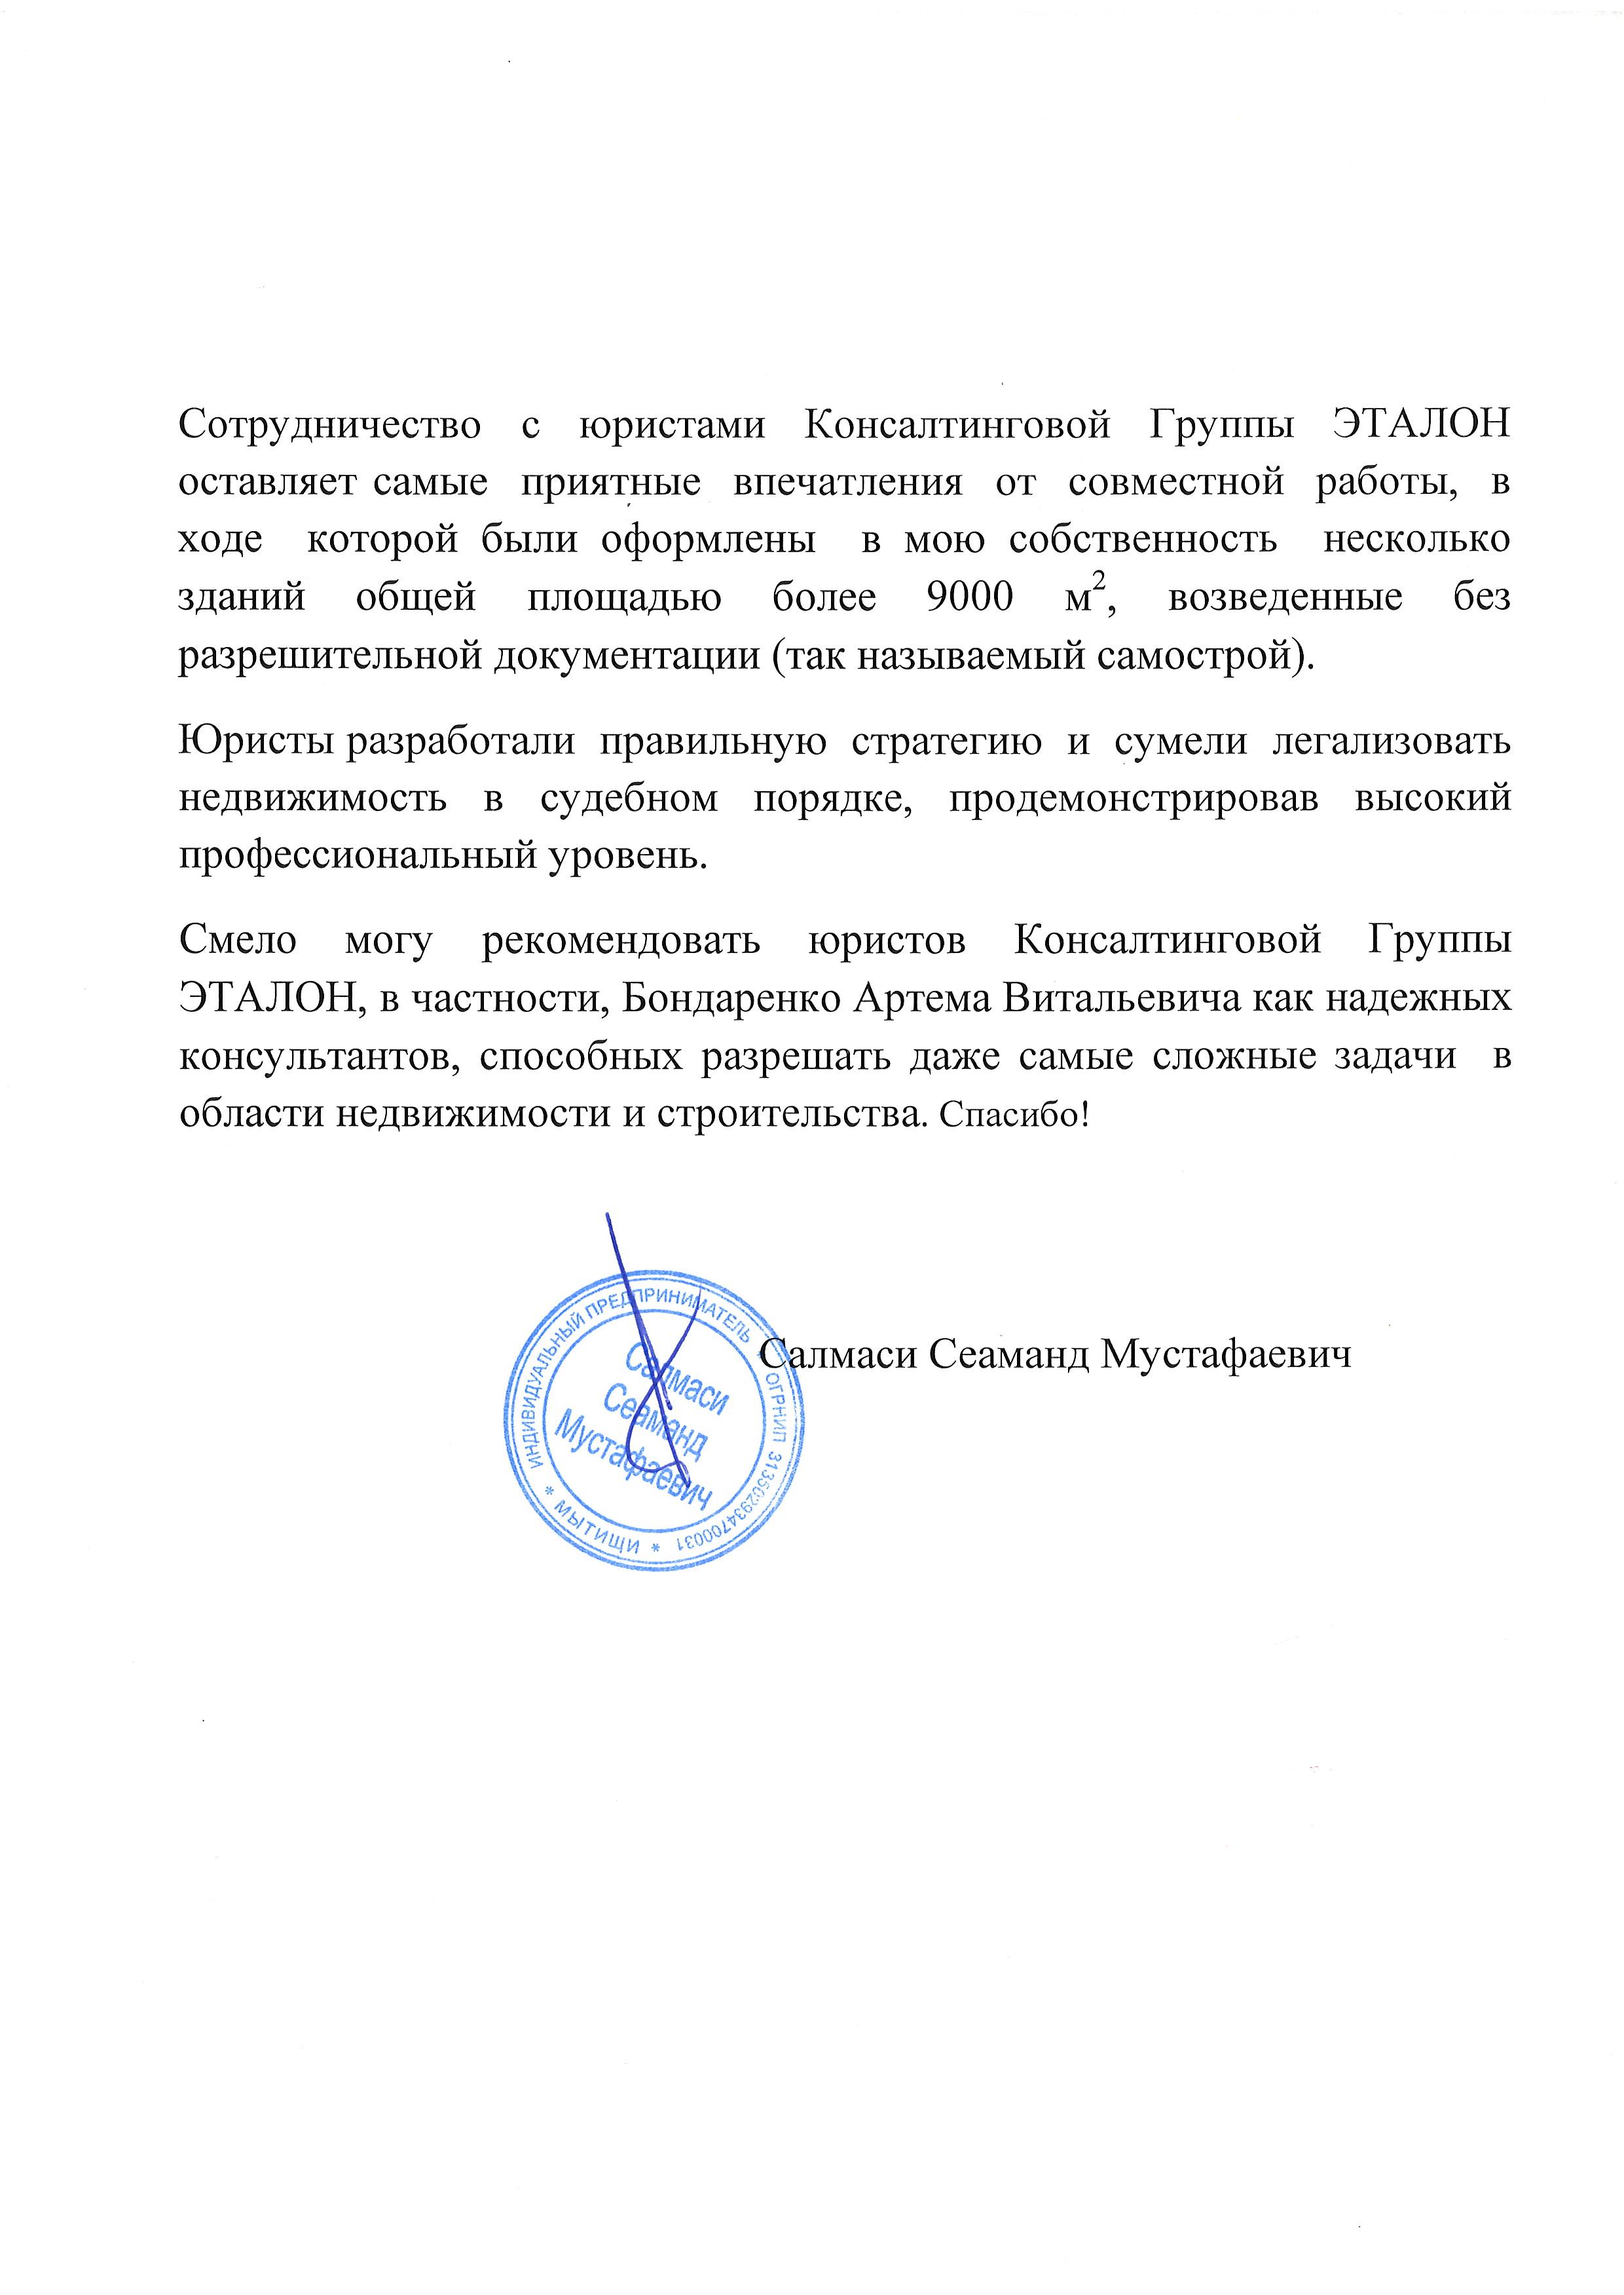 Салмаси Сеаманд Мустафаевич – отзыв